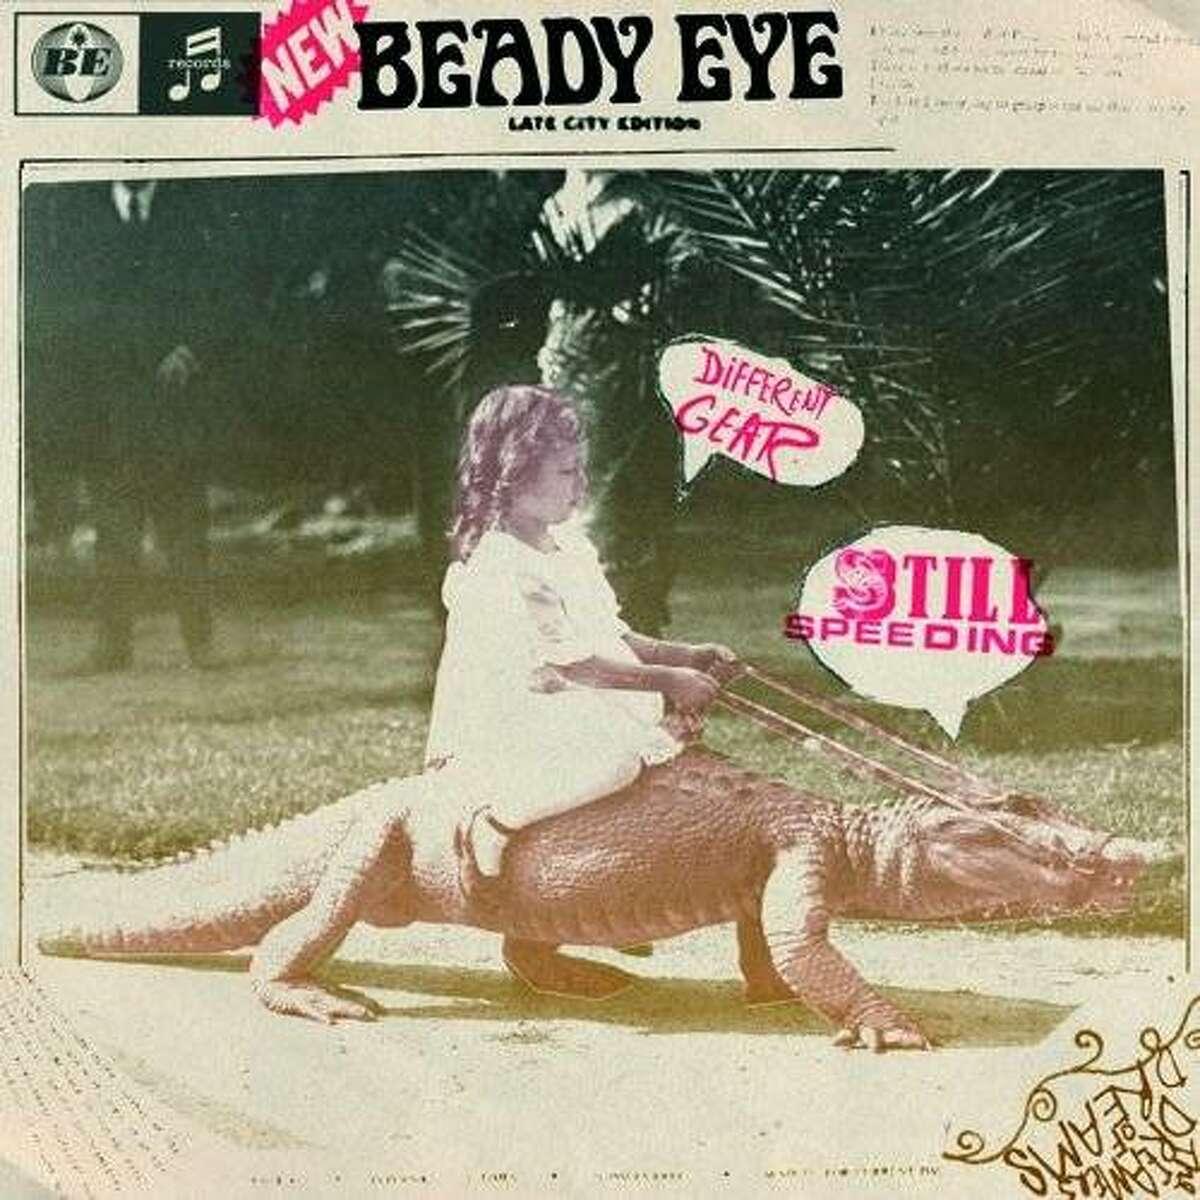 Beady Eye, 'Different Gear, Still Speeding'